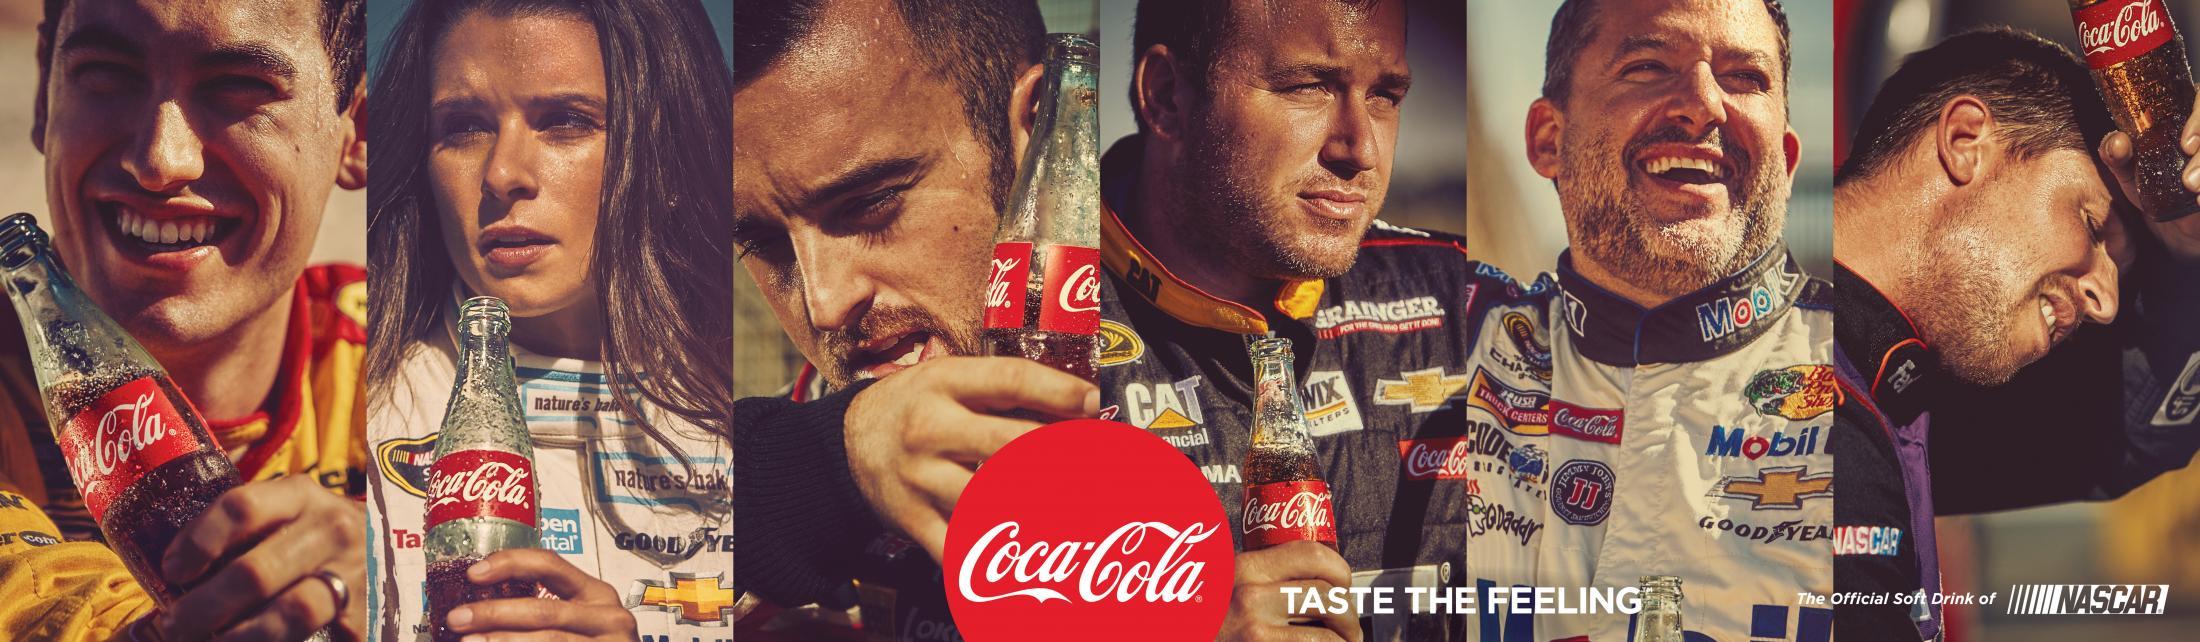 Thumbnail for Coke Racing Family